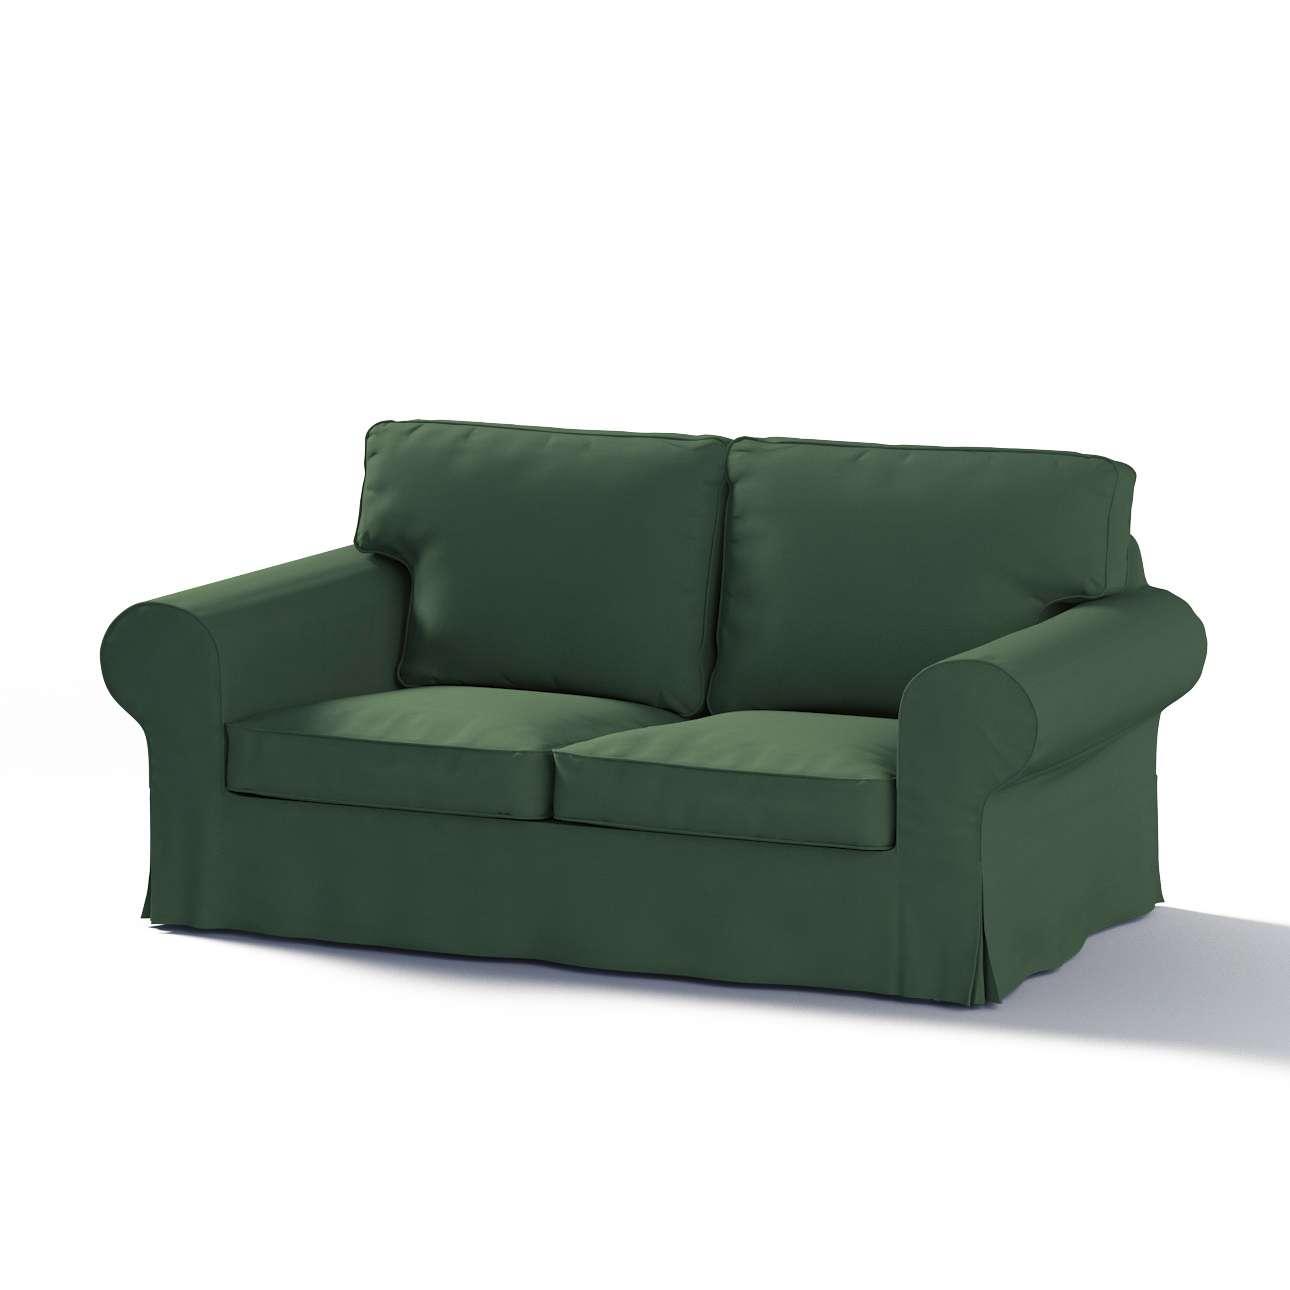 Ektorp 2 sæder sovesofa gammel model<br/>Bredde ca 195cm Betræk uden sofa fra kollektionen Cotton Panama, Stof: 702-06